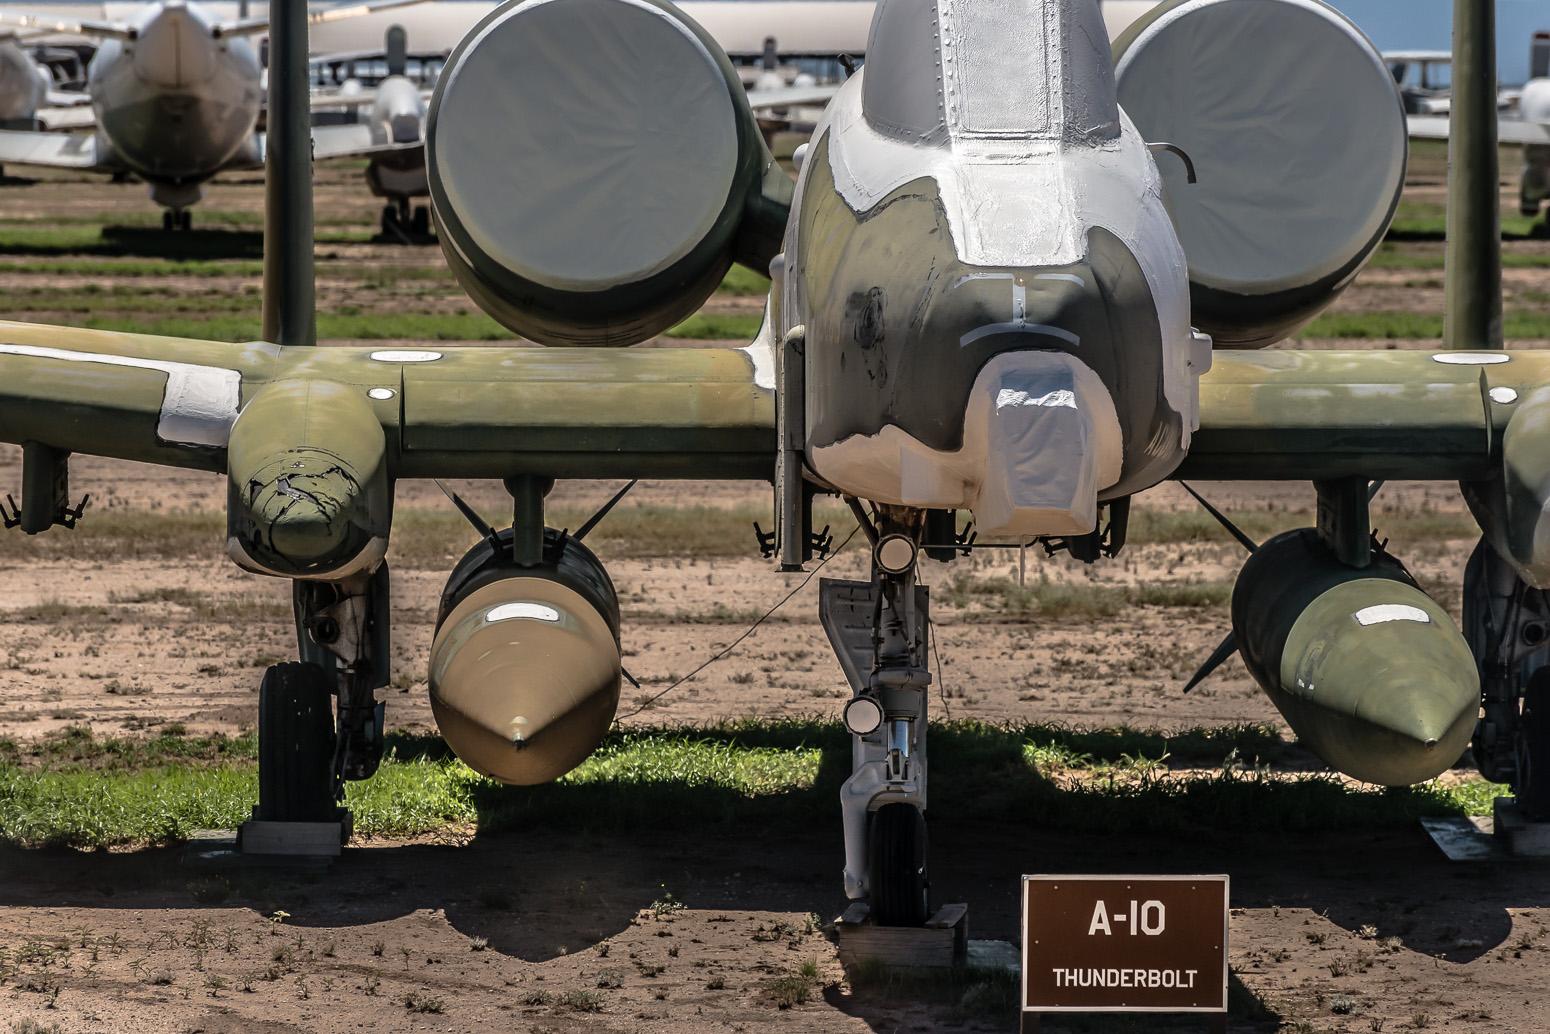 A-10 Thunderbolt, The Boneyard, Davis-Monthan Air Force Base, Tucson, USA